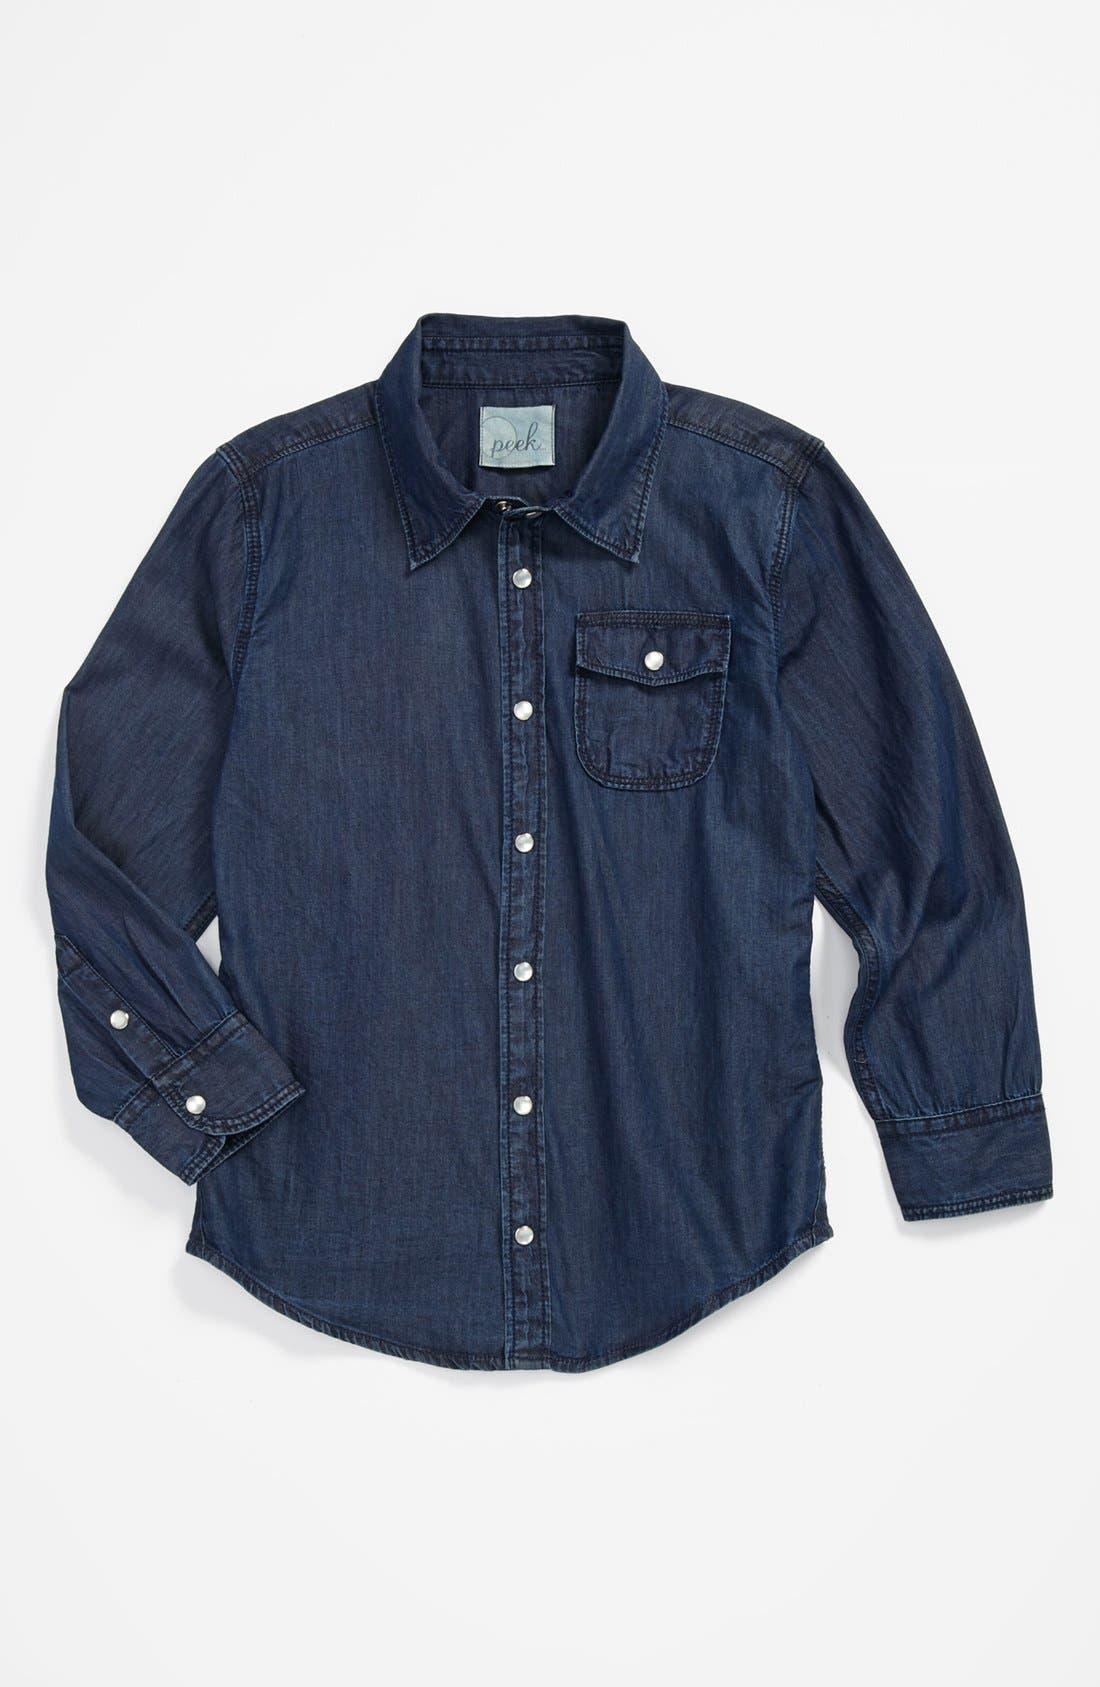 Main Image - Peek 'Logan' Chambray Shirt (Big Boys)